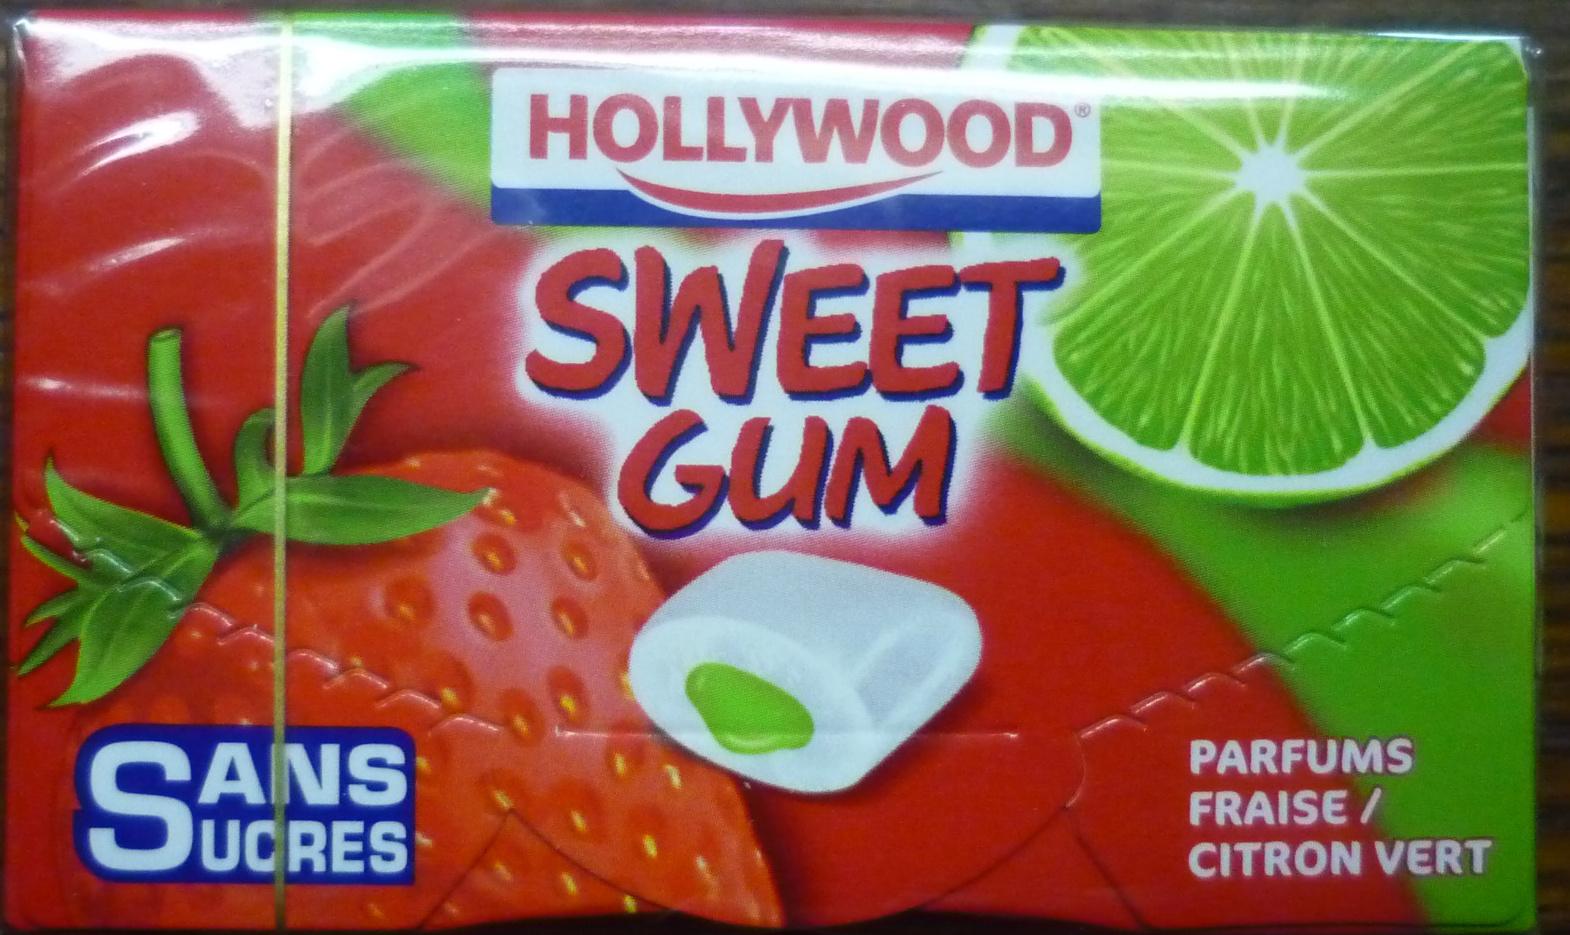 Sweet Gum Fraise-Citron Vert - Hollywood - 22 g